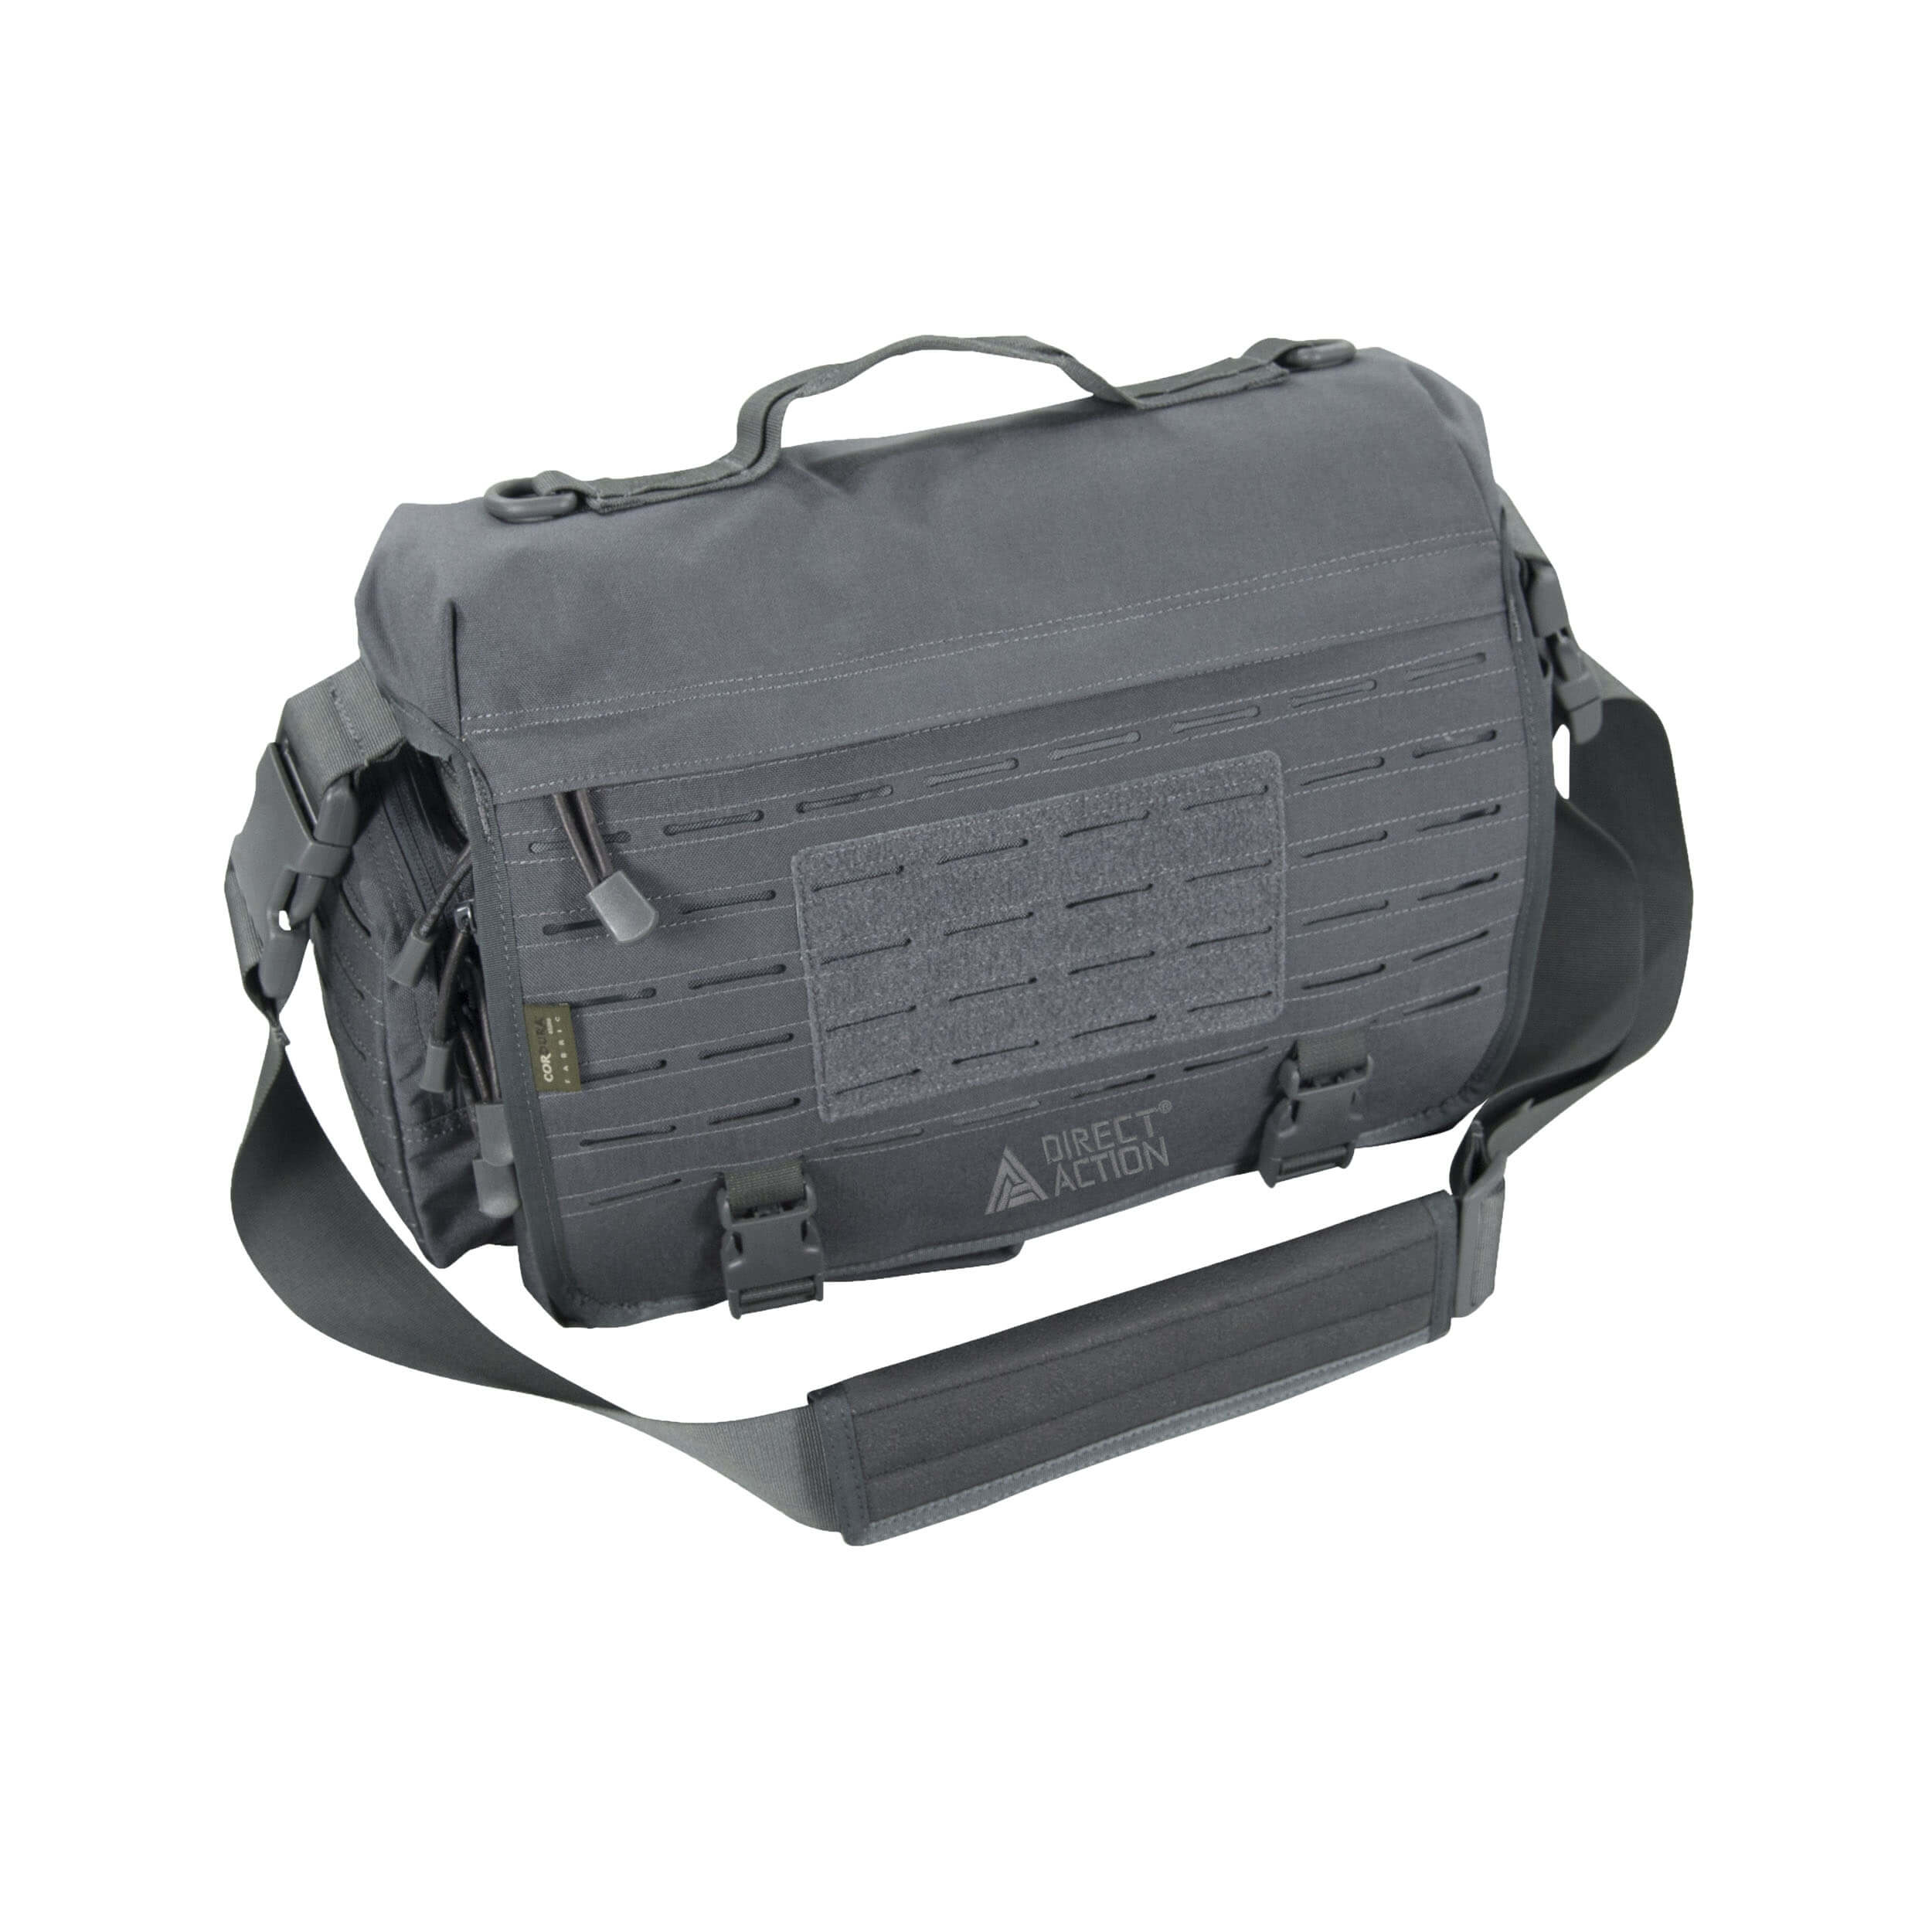 Direct Action MESSENGER BAG -Cordura- Shadow Grey